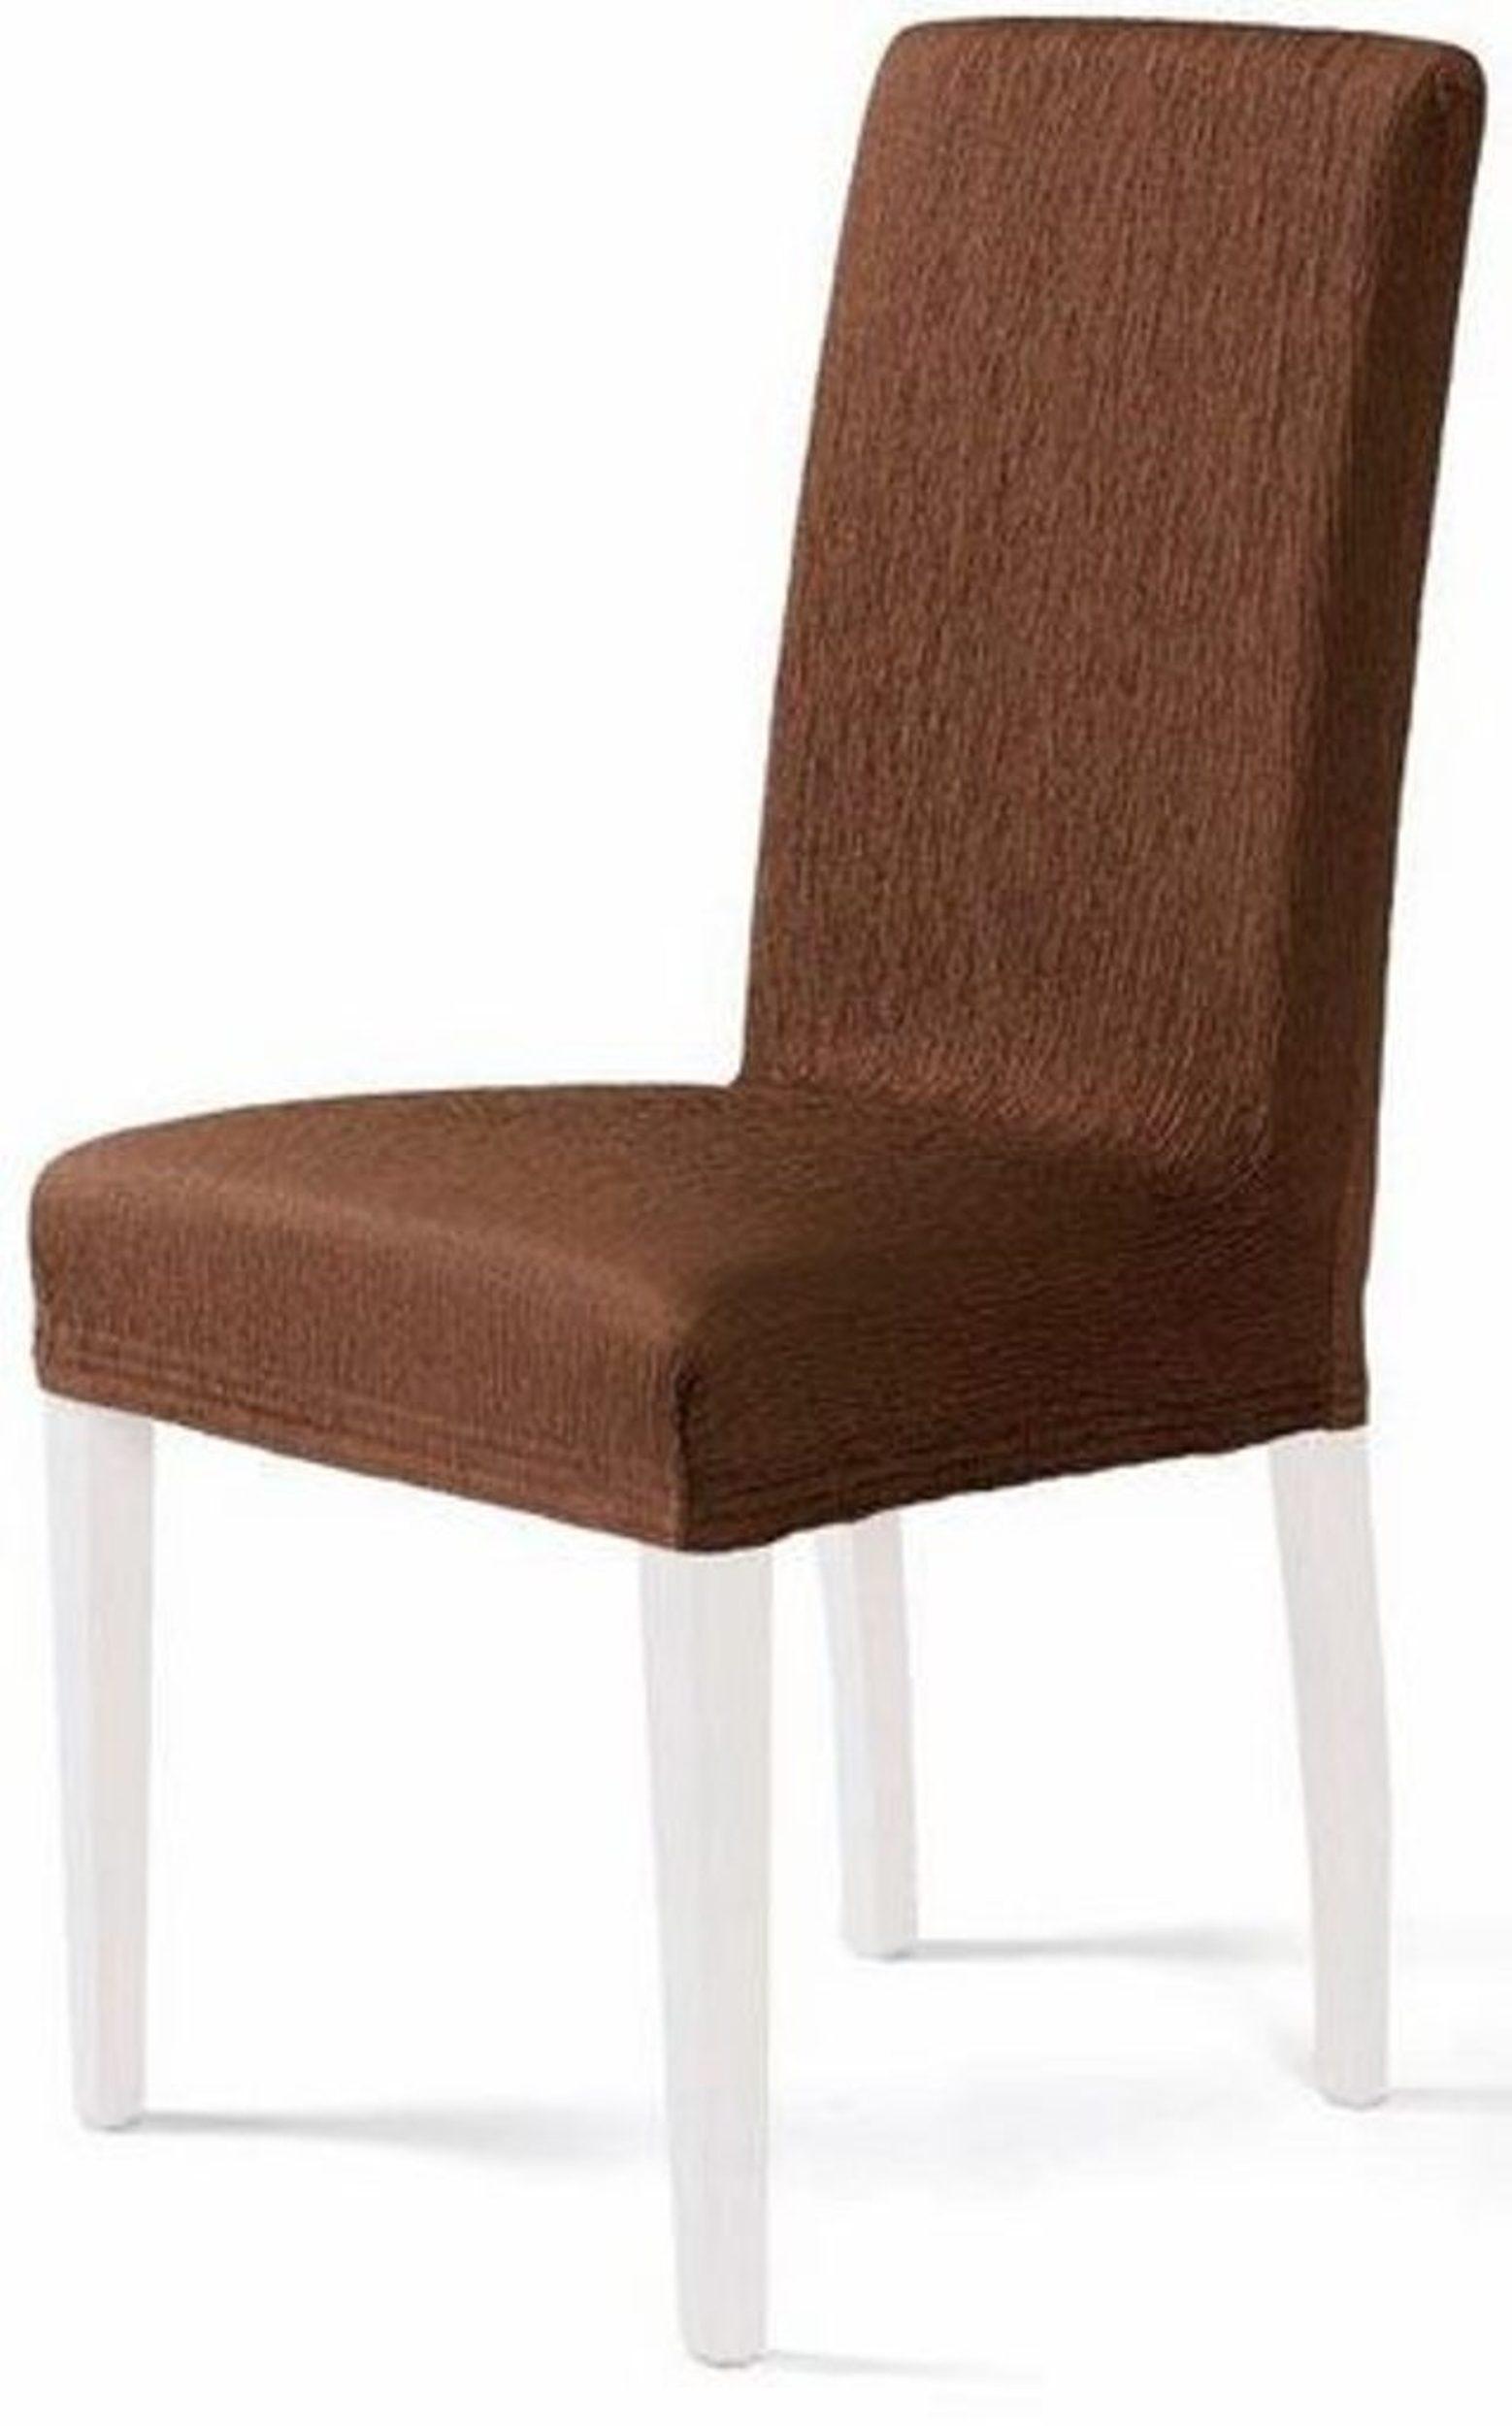 Levně Komashop Potah na židli JARA Barva: Hnědá